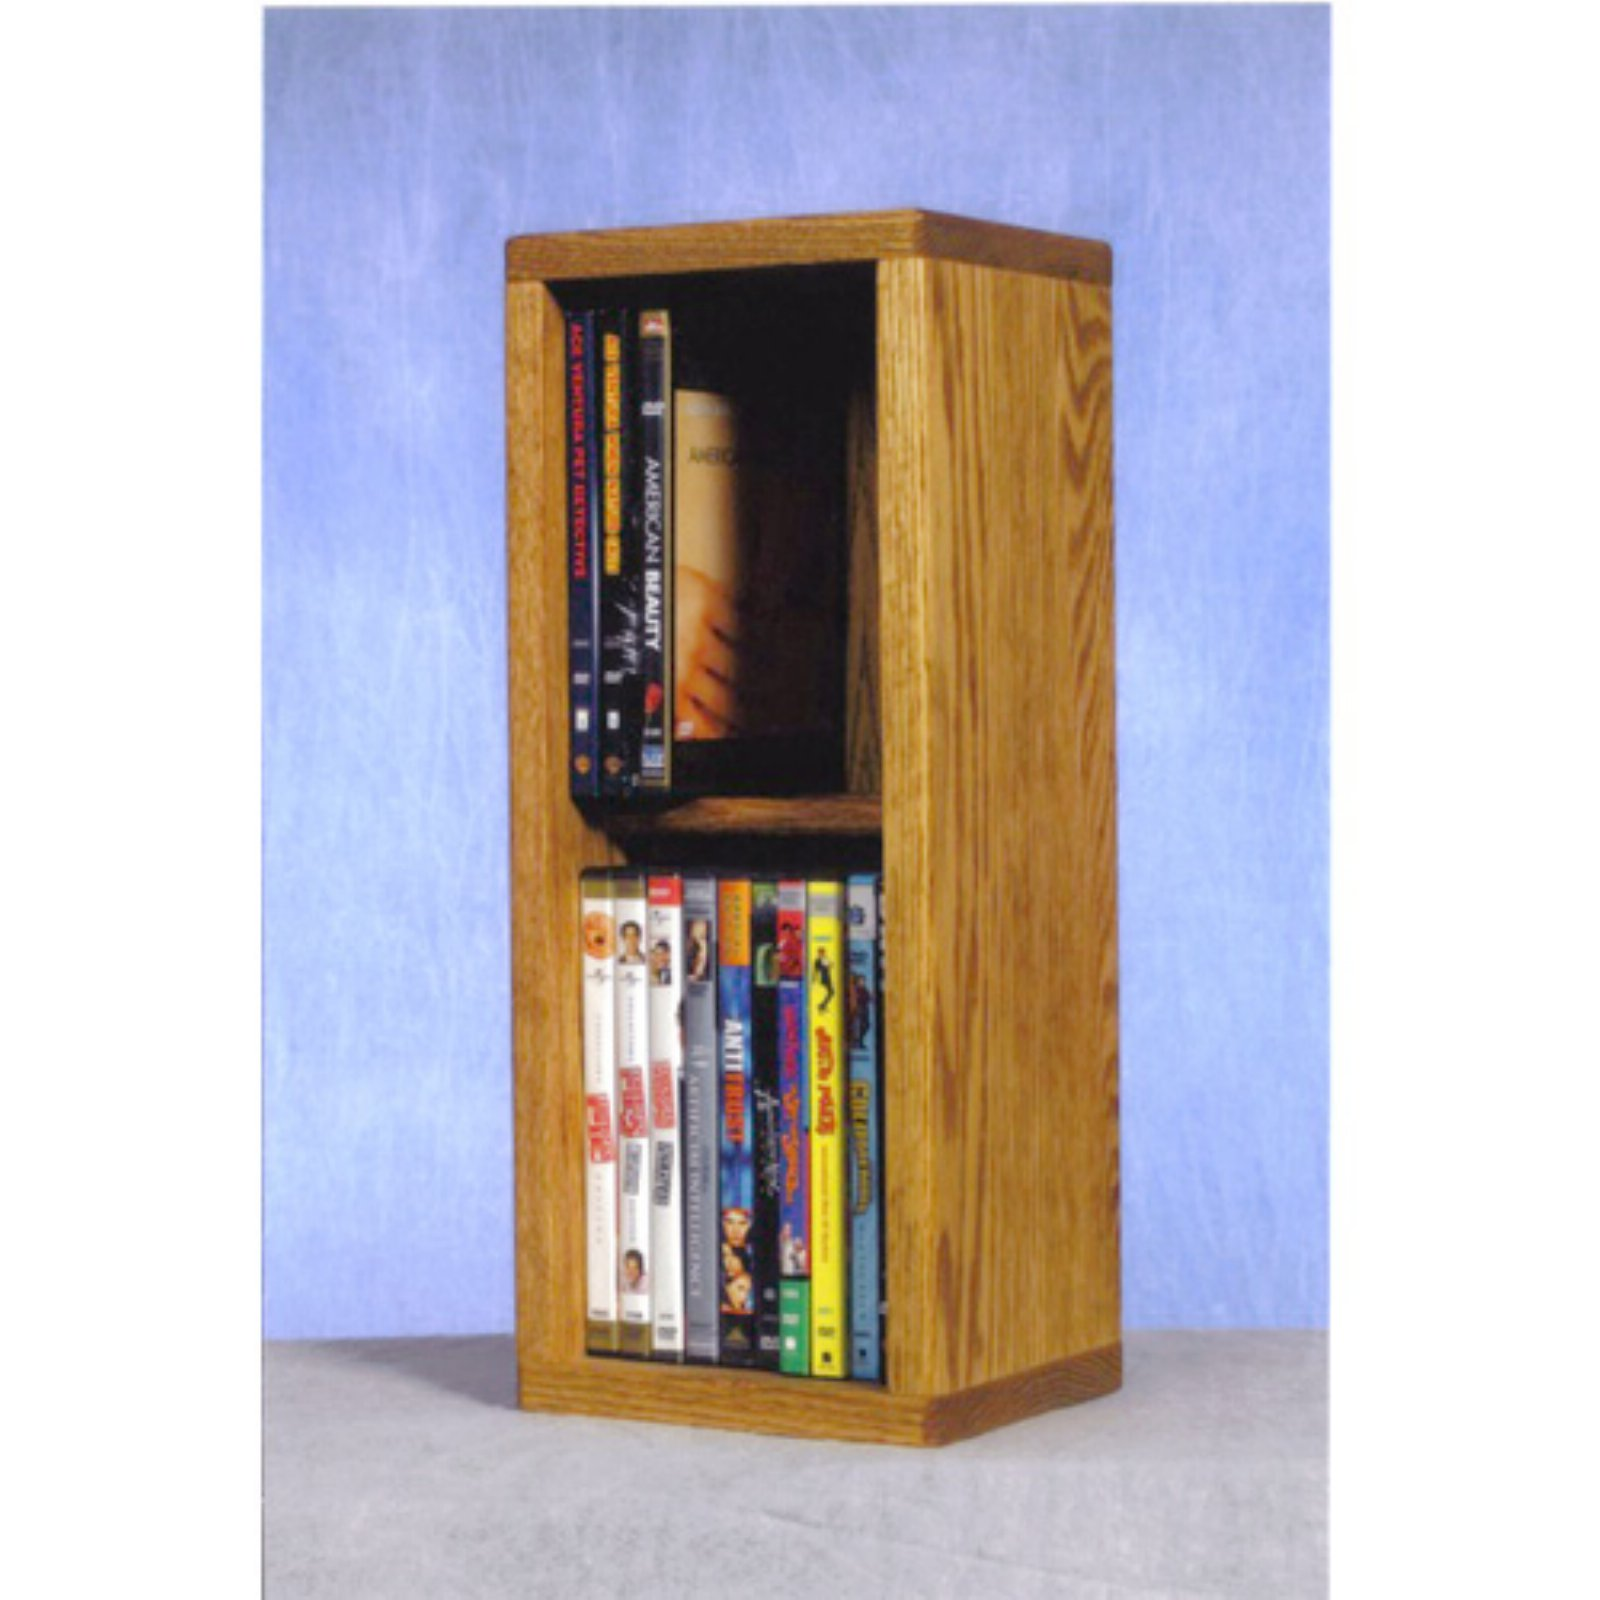 The Wood Shed Solid Oak 2 Row Dowel 20 DVD Media Rack